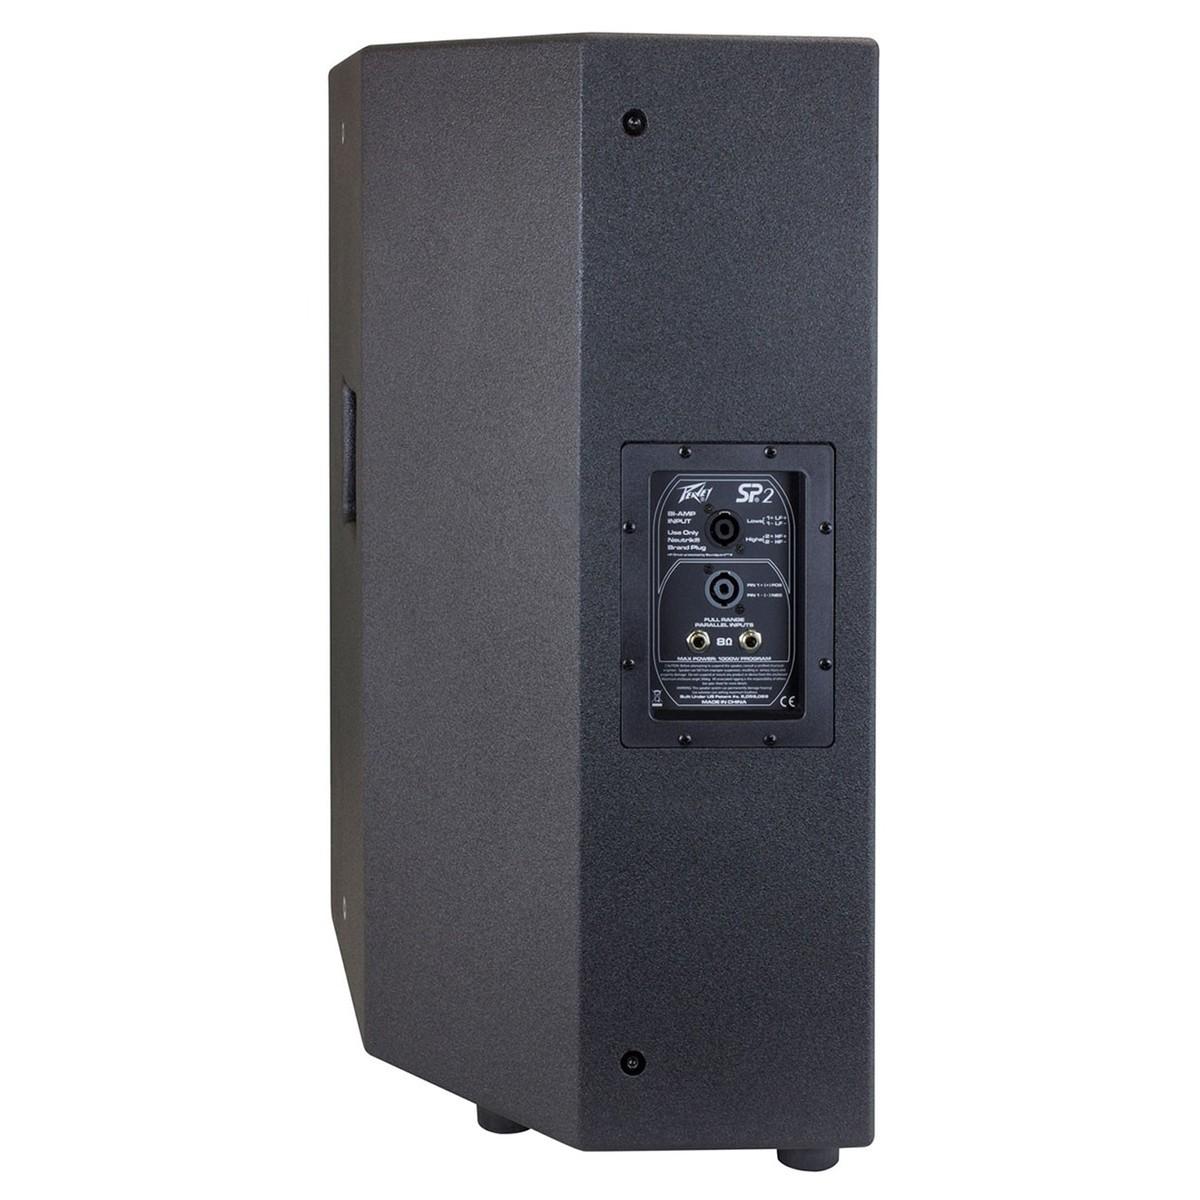 Peavey speaker